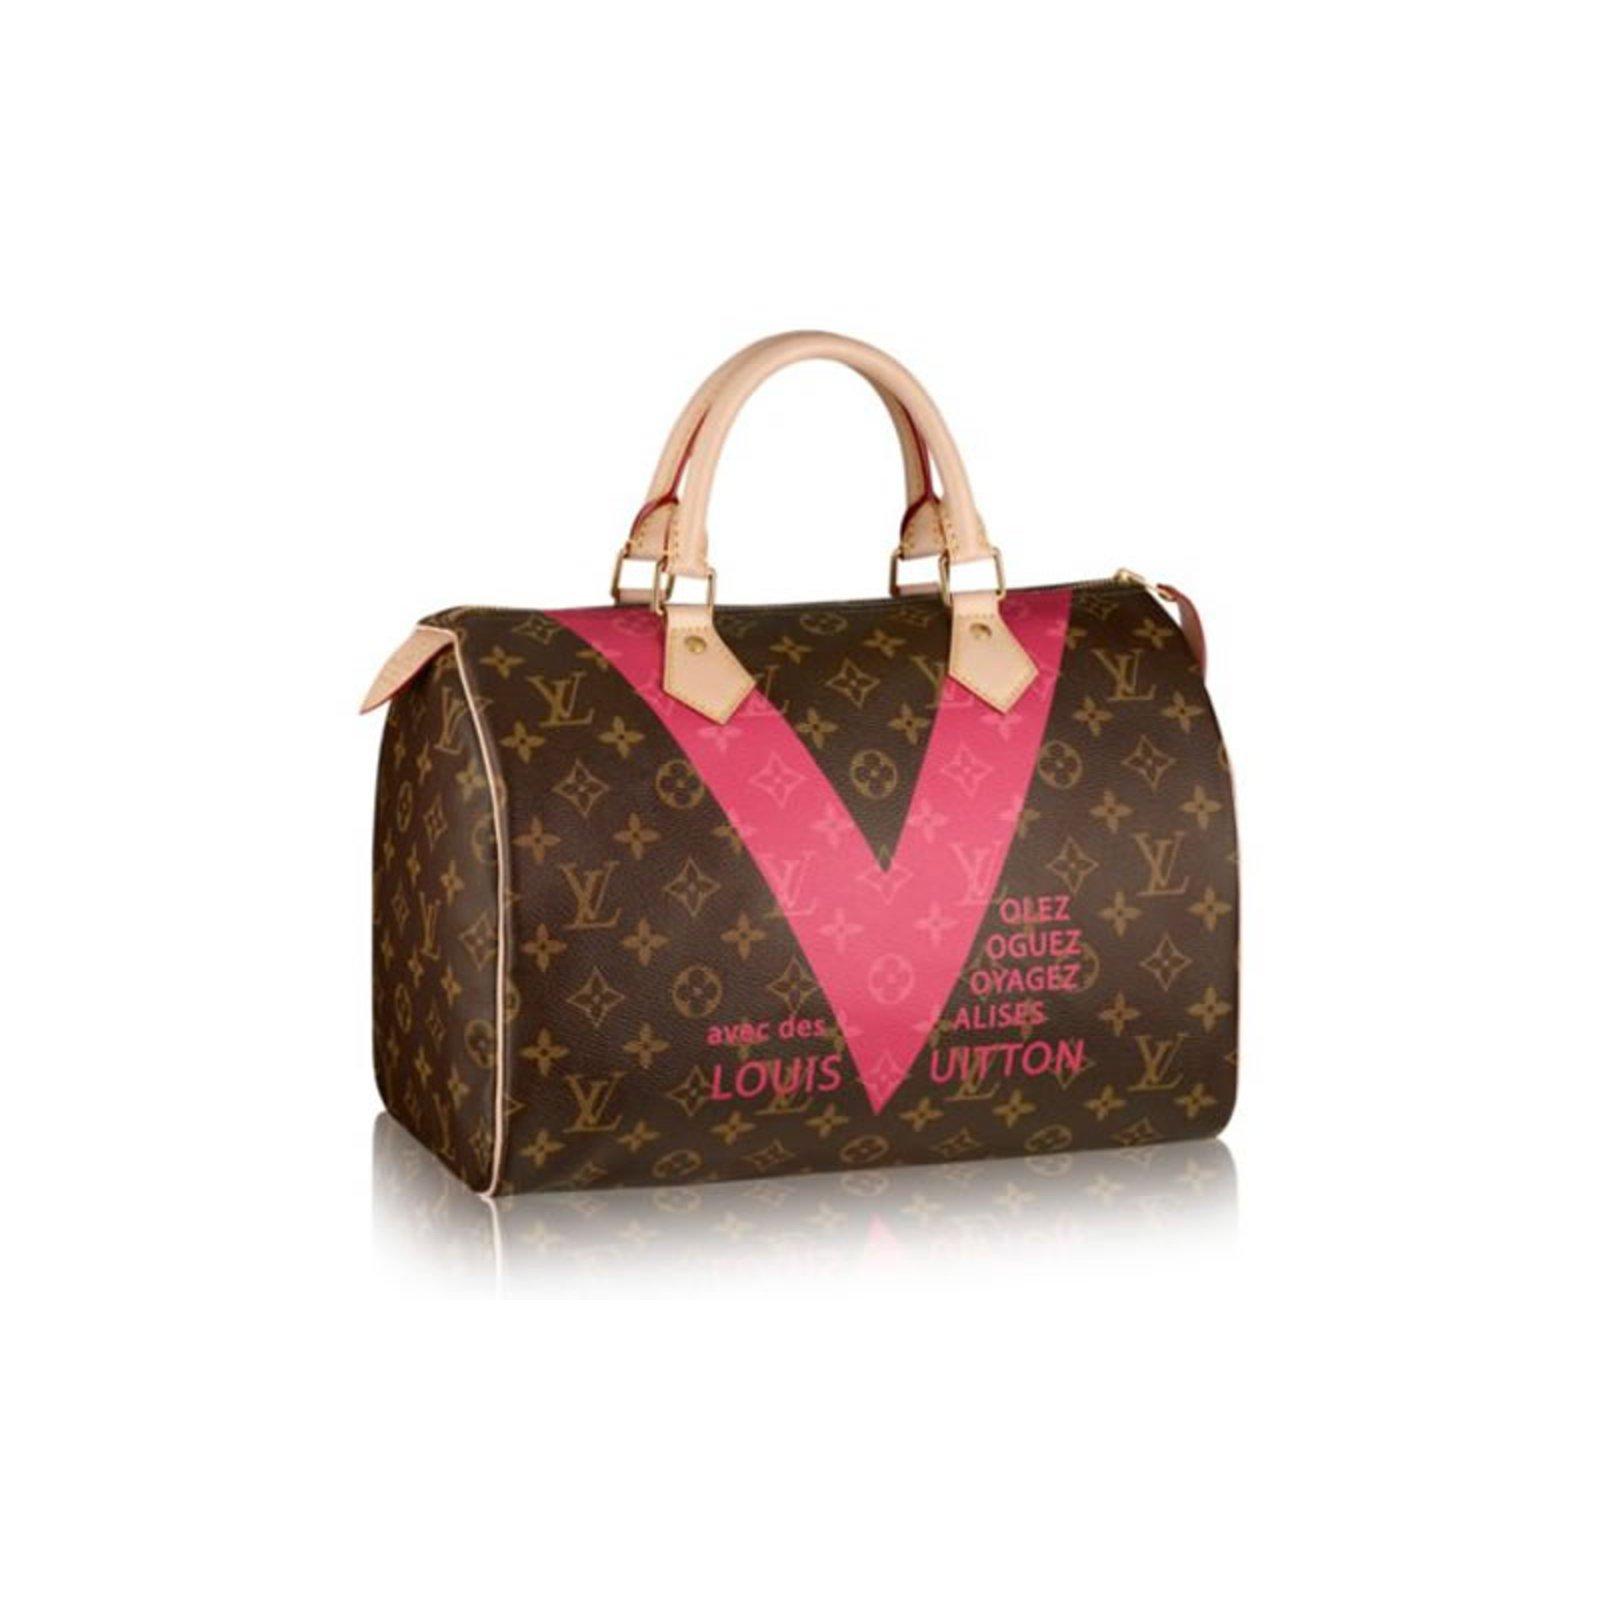 Sacs à main Louis Vuitton SPEEDY 30 V MONO GRENADE Cuir Rose ref.32195 10738beb0387